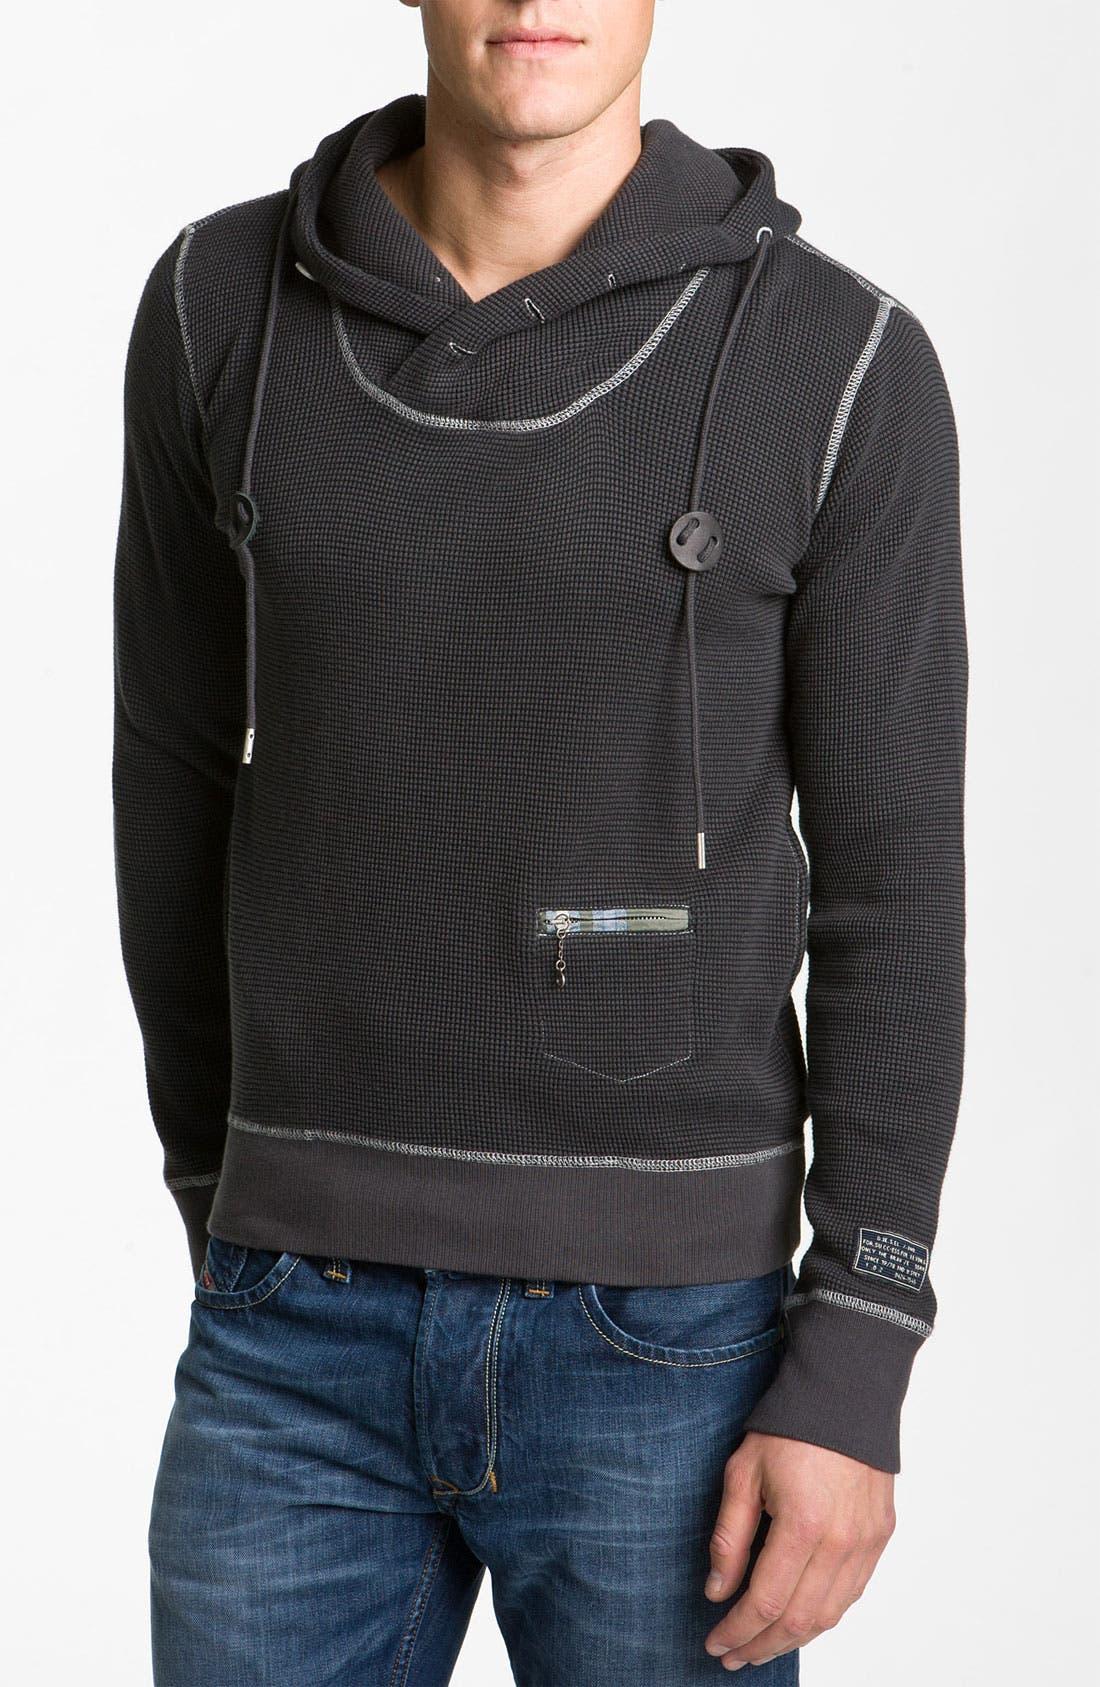 Main Image - DIESEL® 'Sybill' Fleece Pullover Sweatshirt